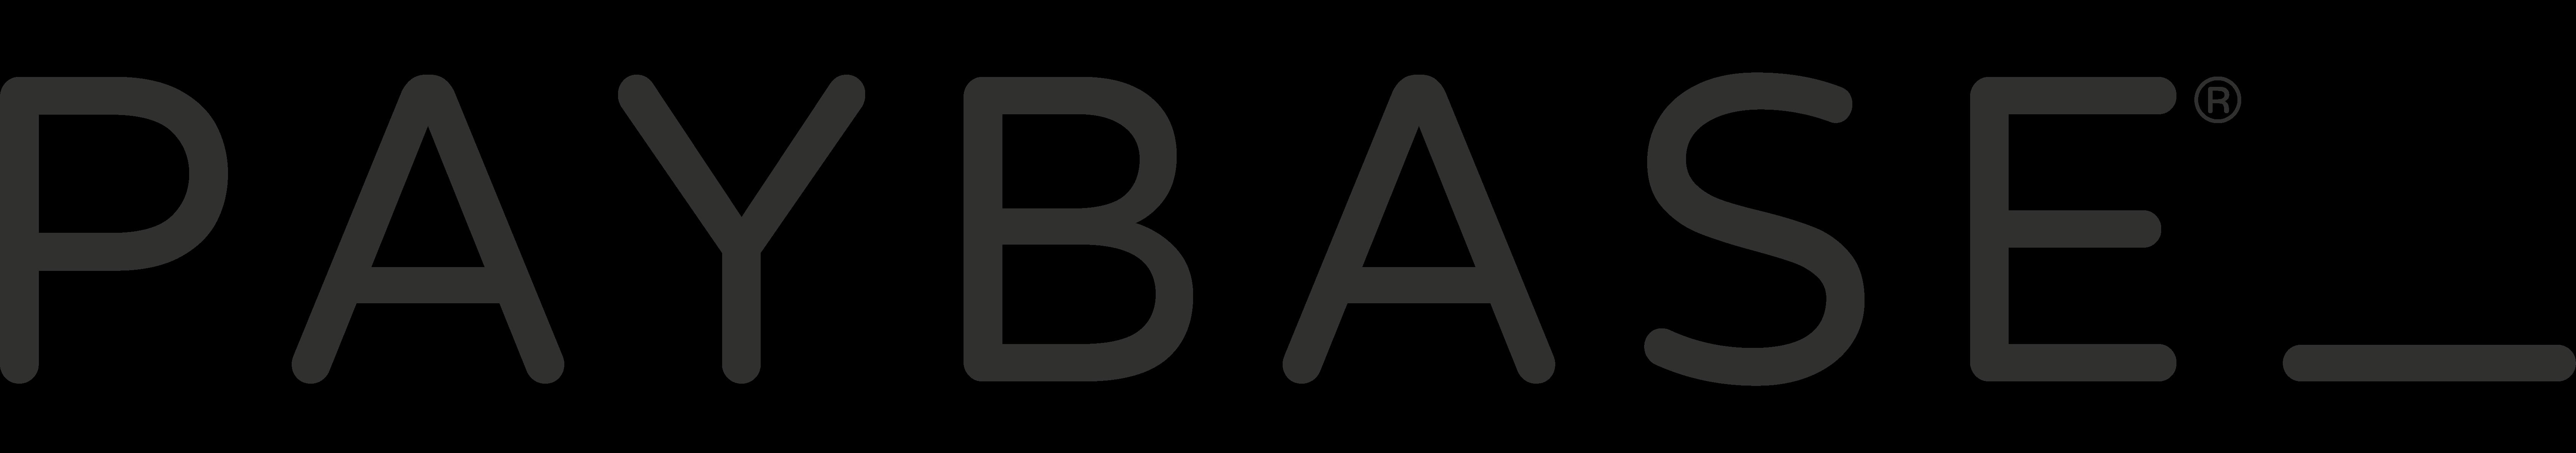 Start-Up: Paybase